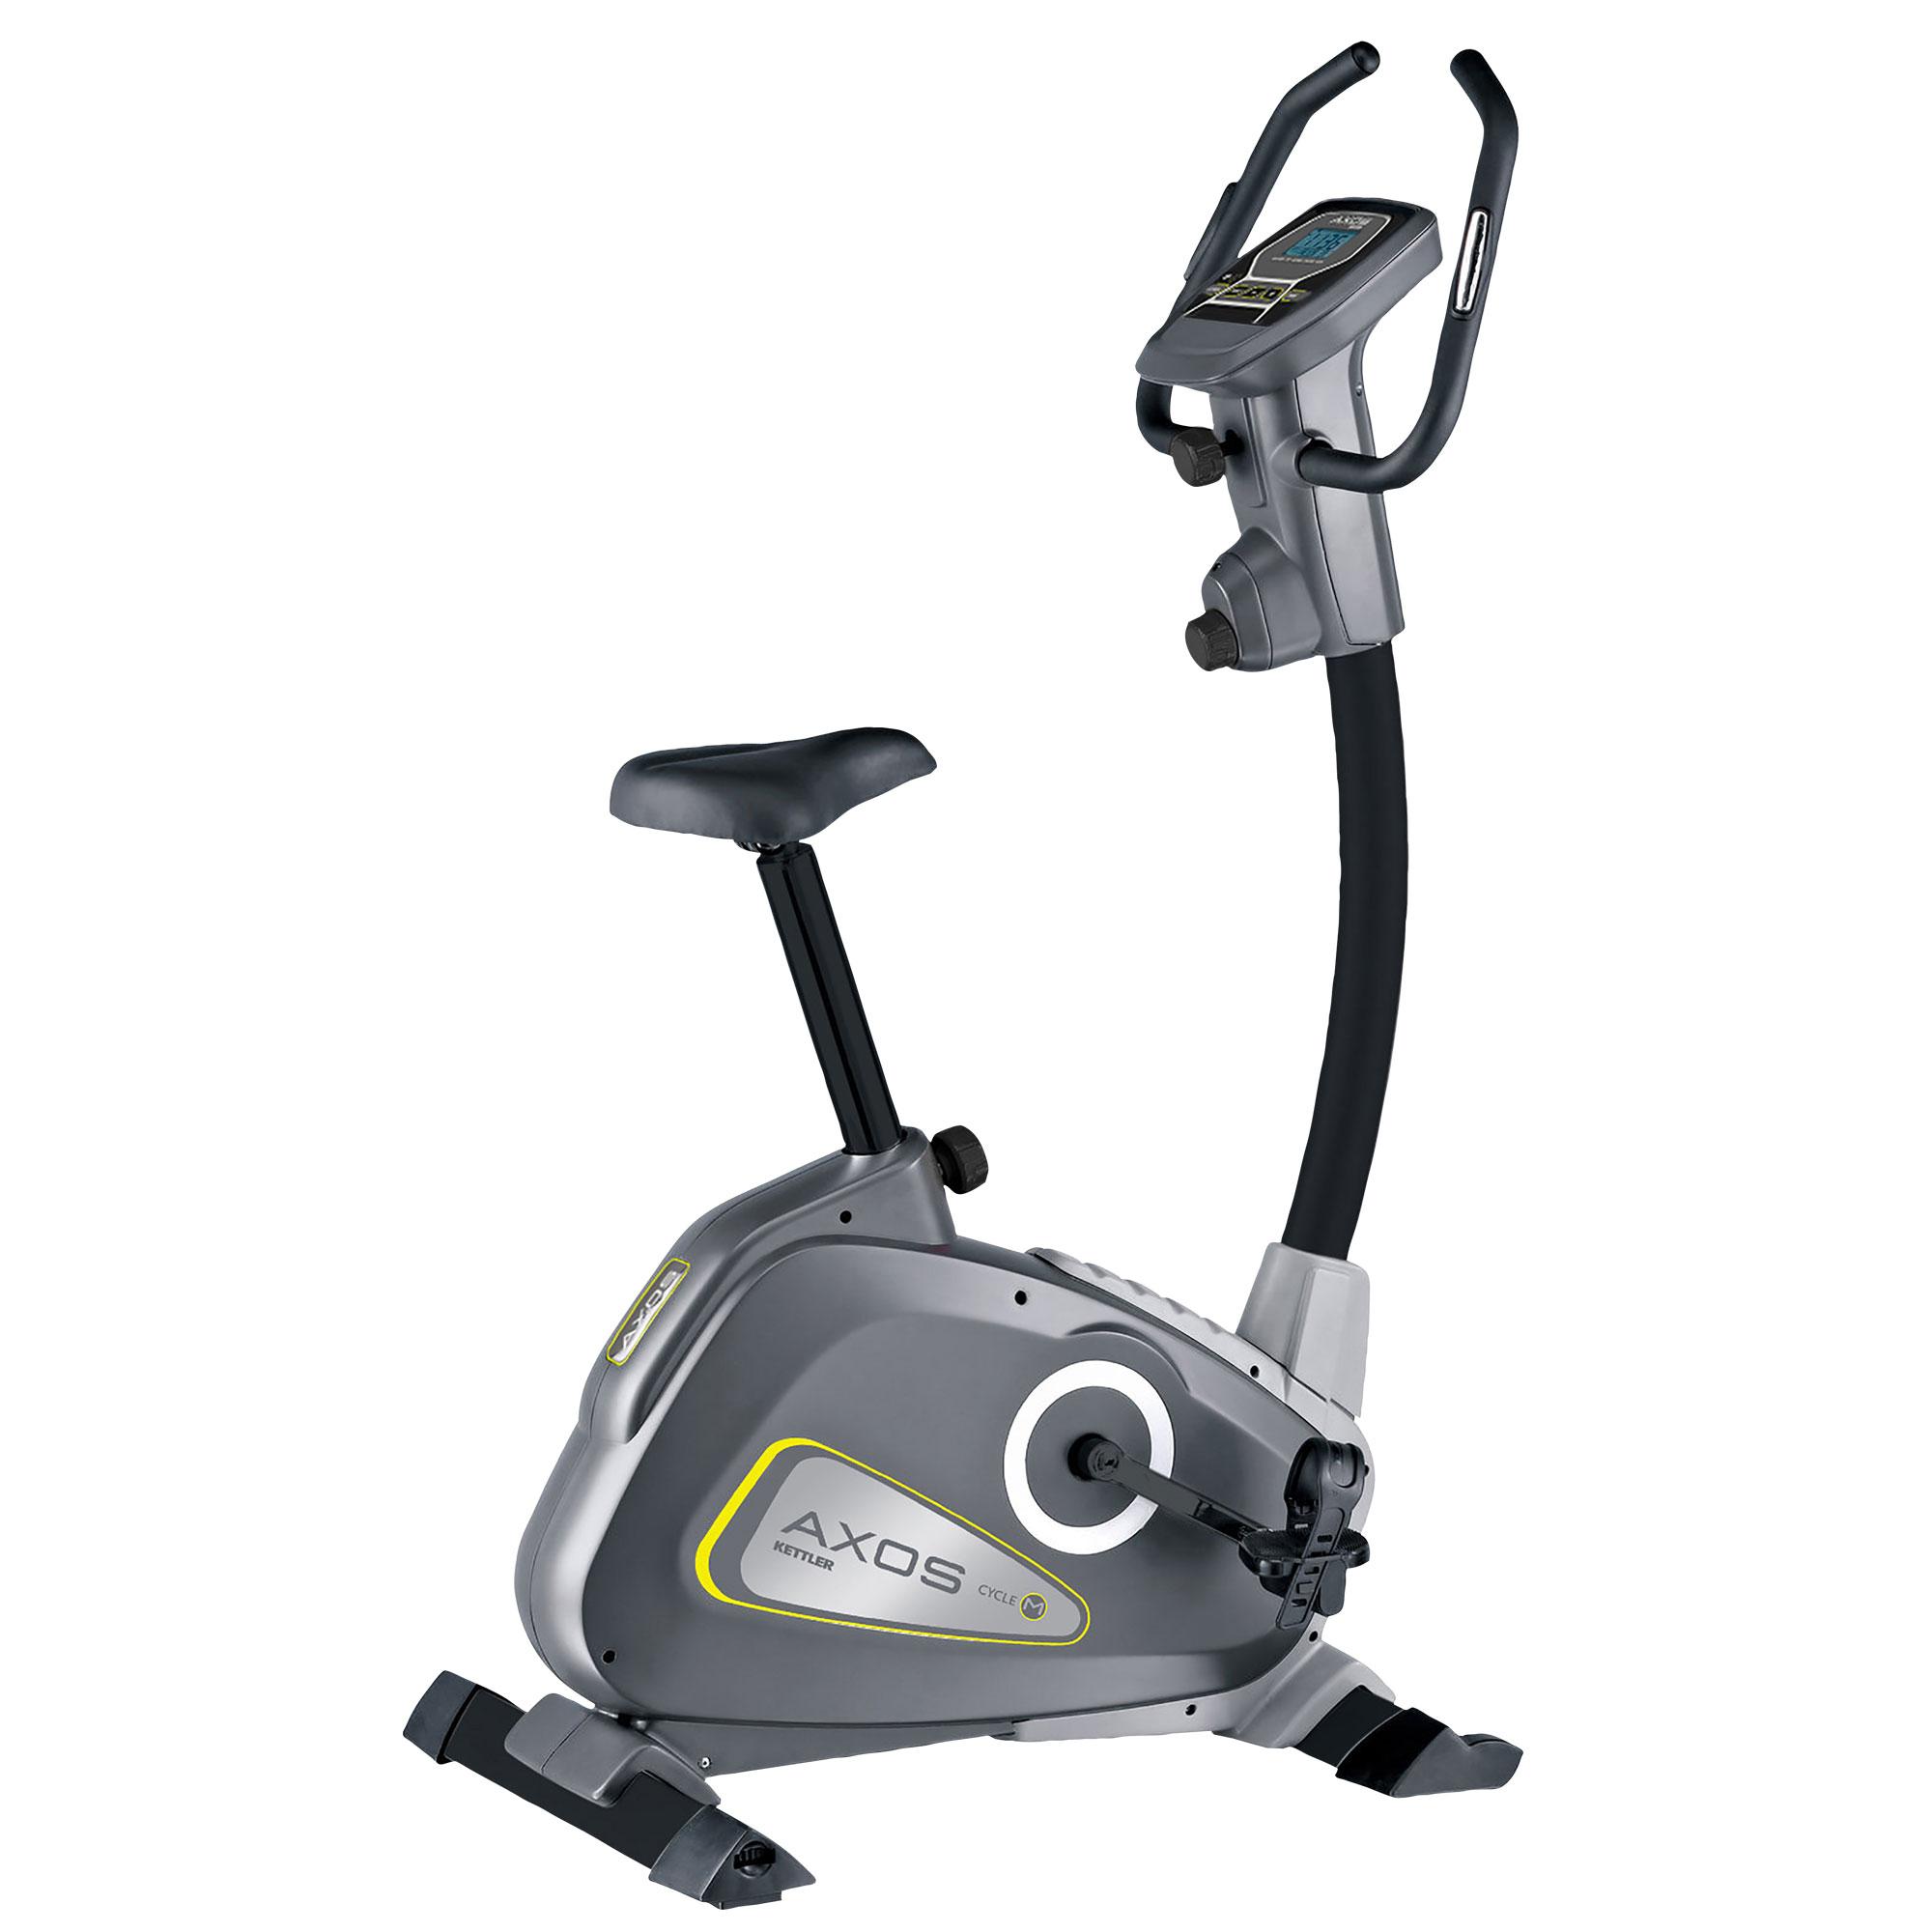 Kettler Cycle M hometrainer - Gratis trainingsschema